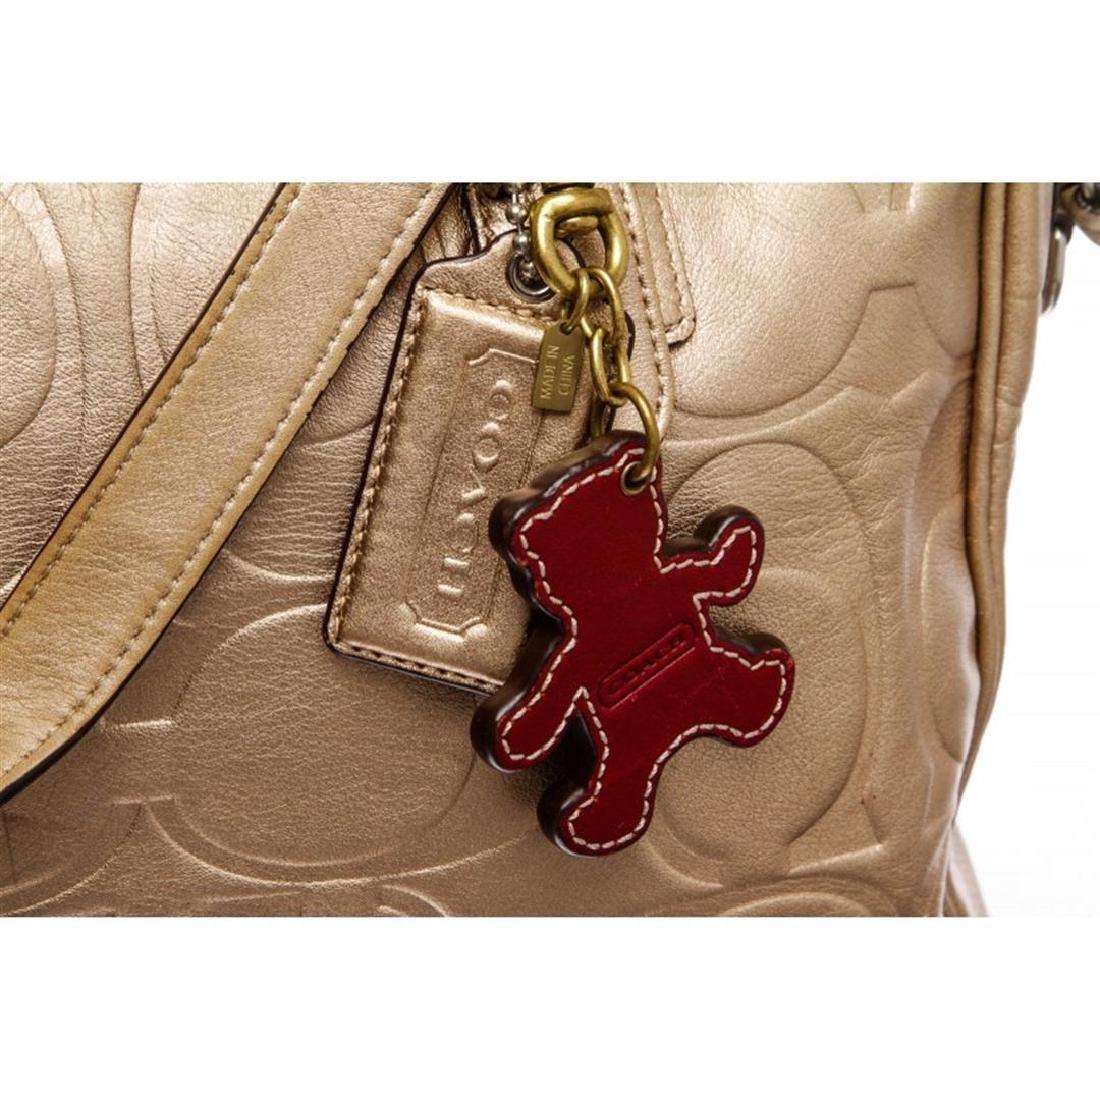 Coach Metallic Gold Monogram Leather Tote Bag - 6